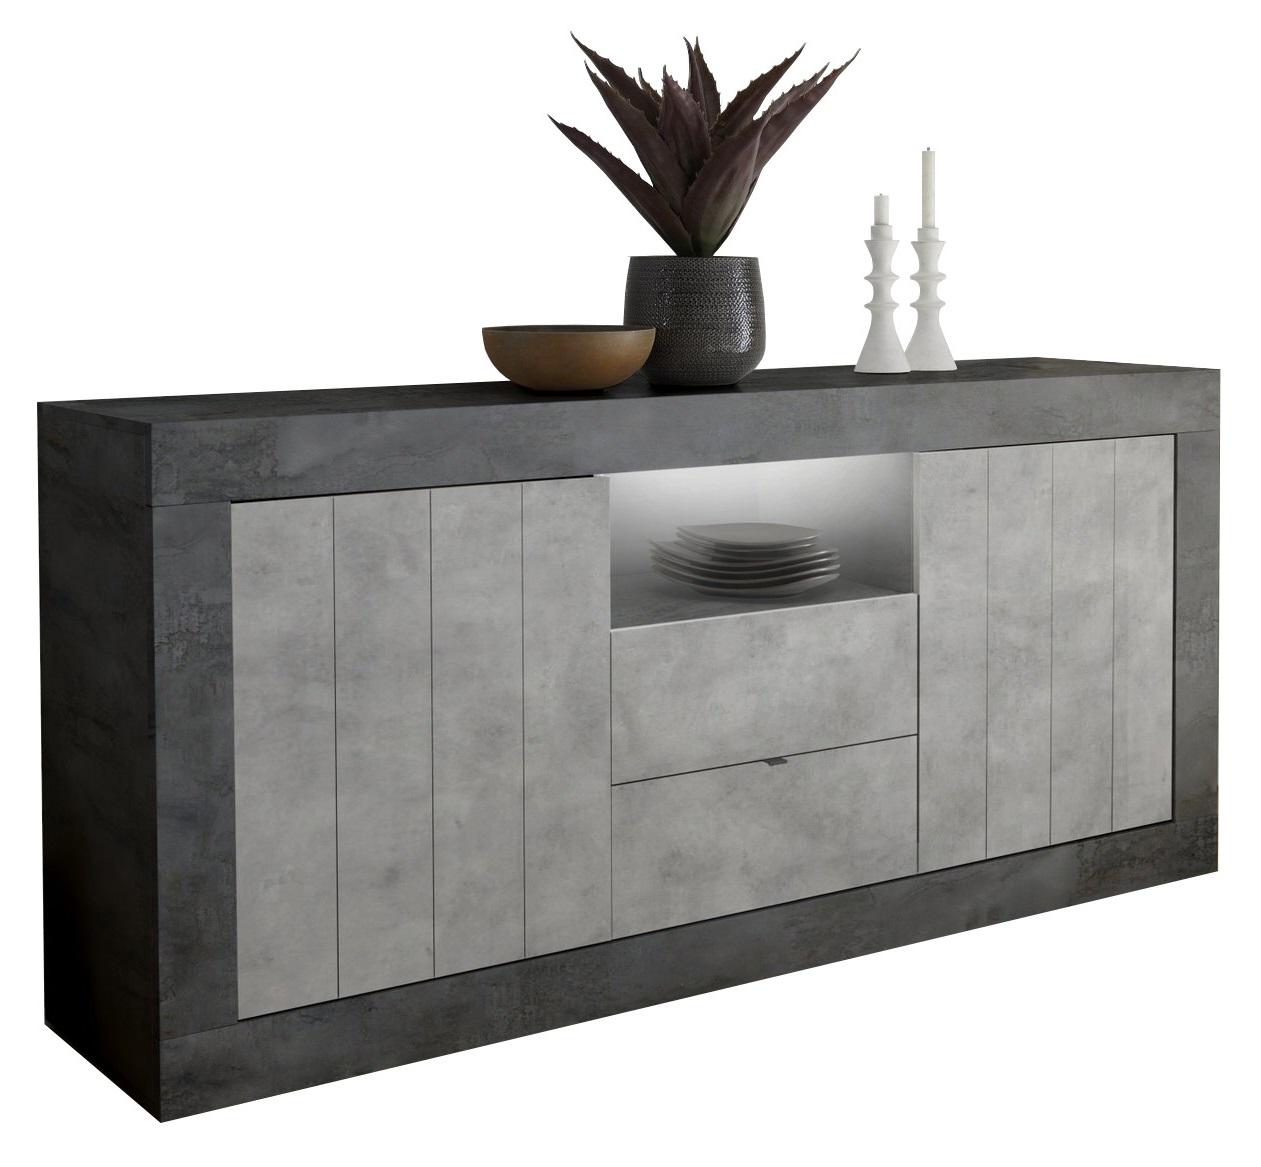 Dressoir Urbino 184 cm breed in oxid met grijs beton | Pesaro Mobilia